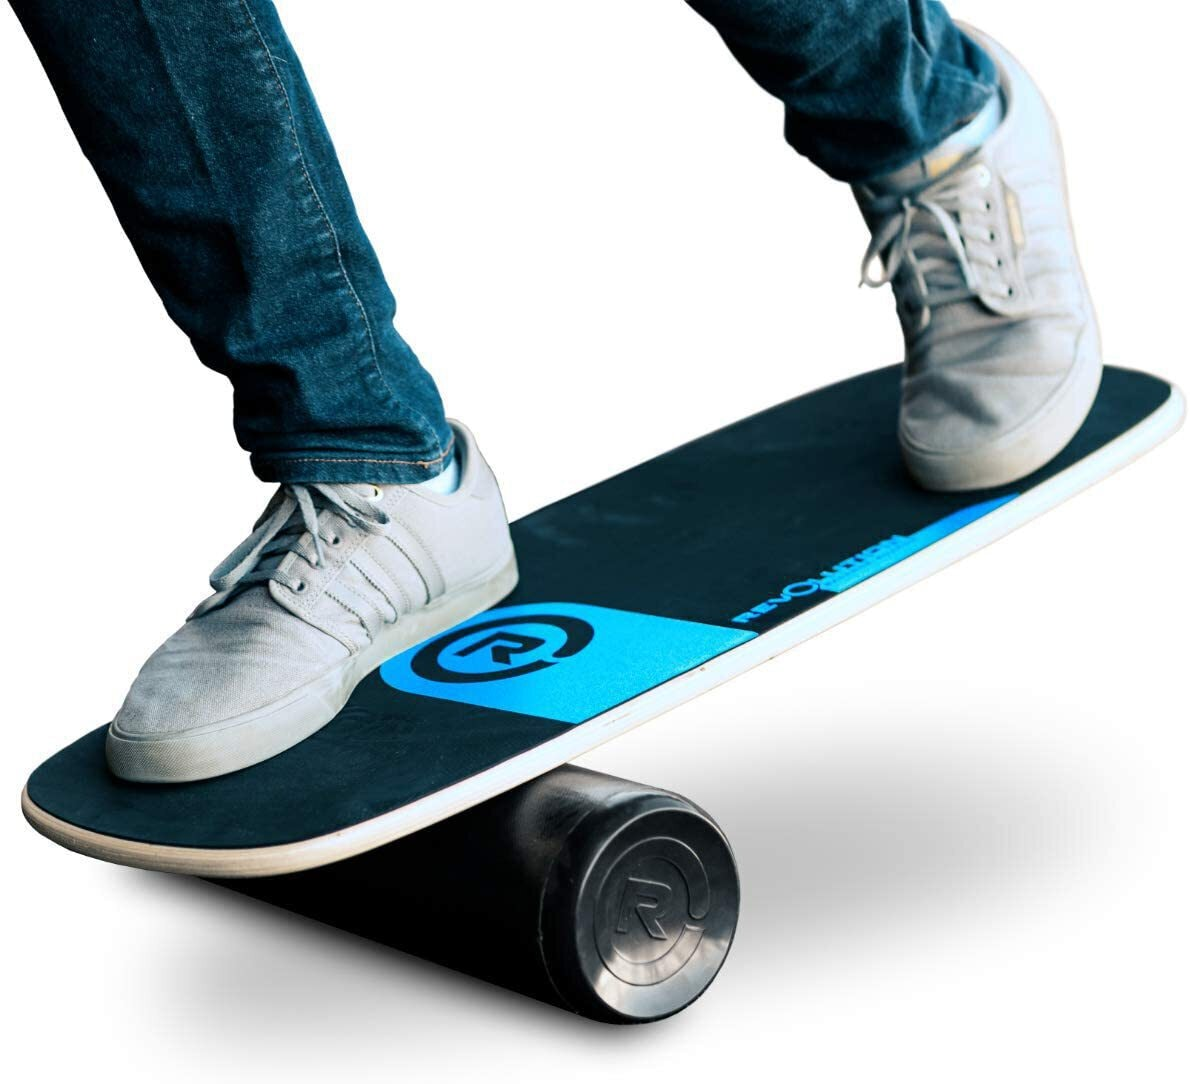 Revolution 101 Balance Board